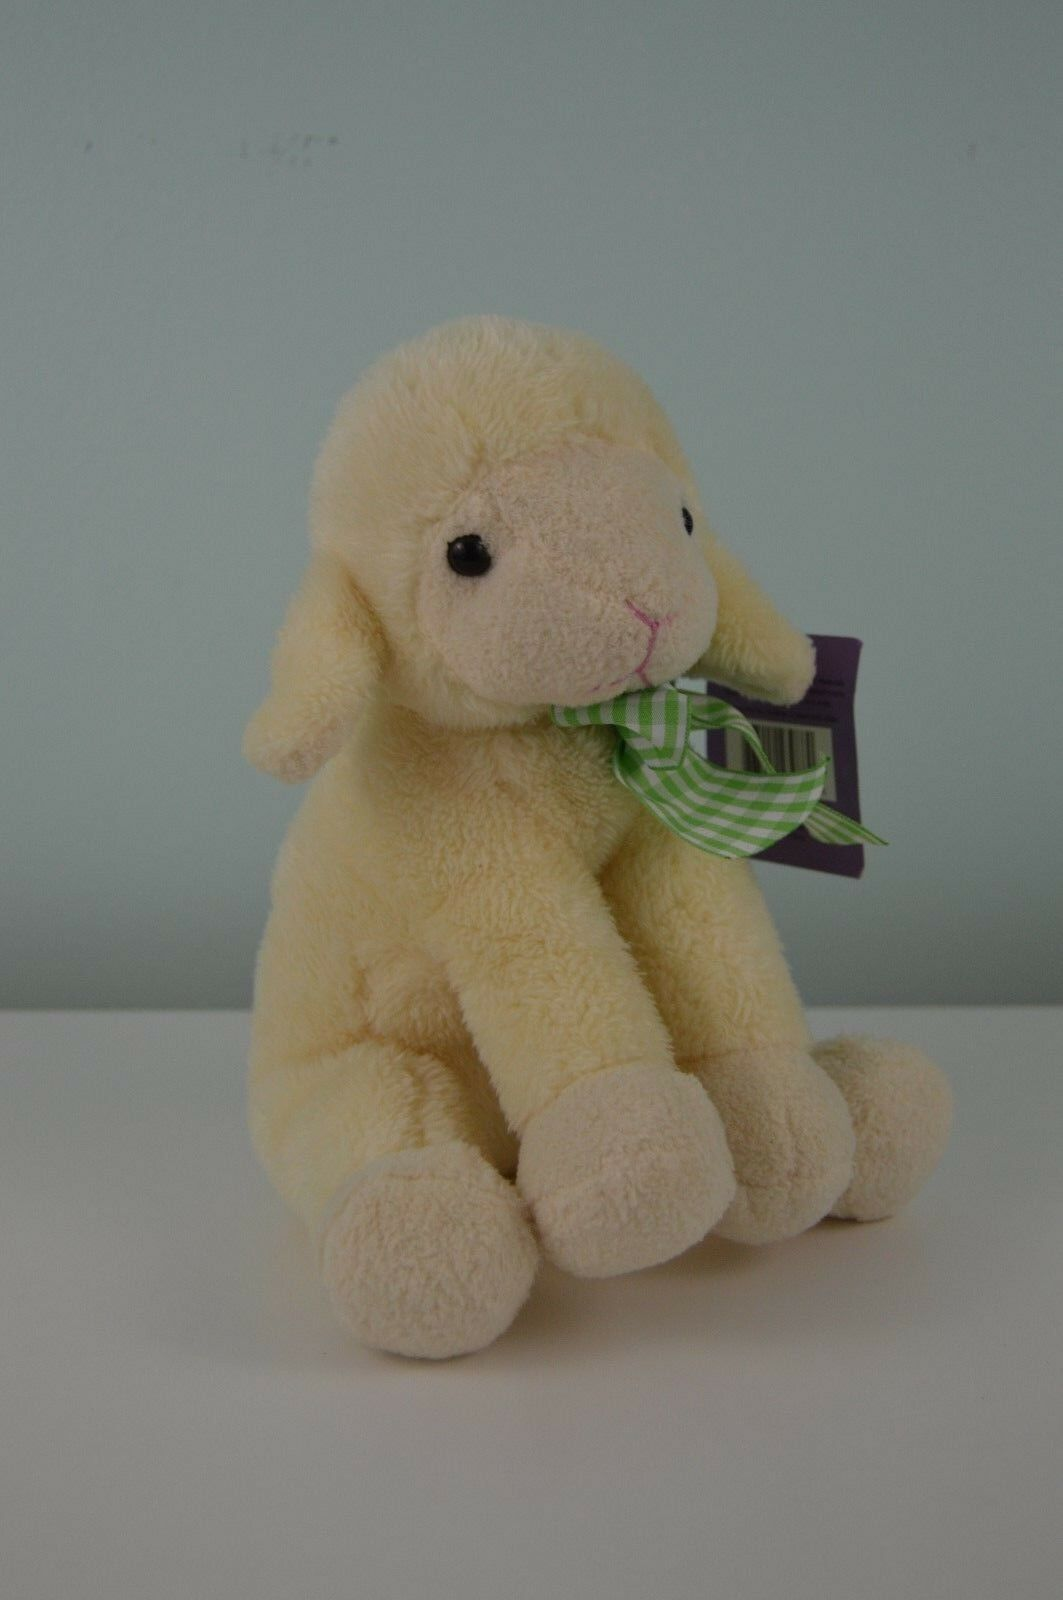 Animal Adventure Lamb Sheep Plush Stuffed Animal Off White Cream Green Plaid Bow